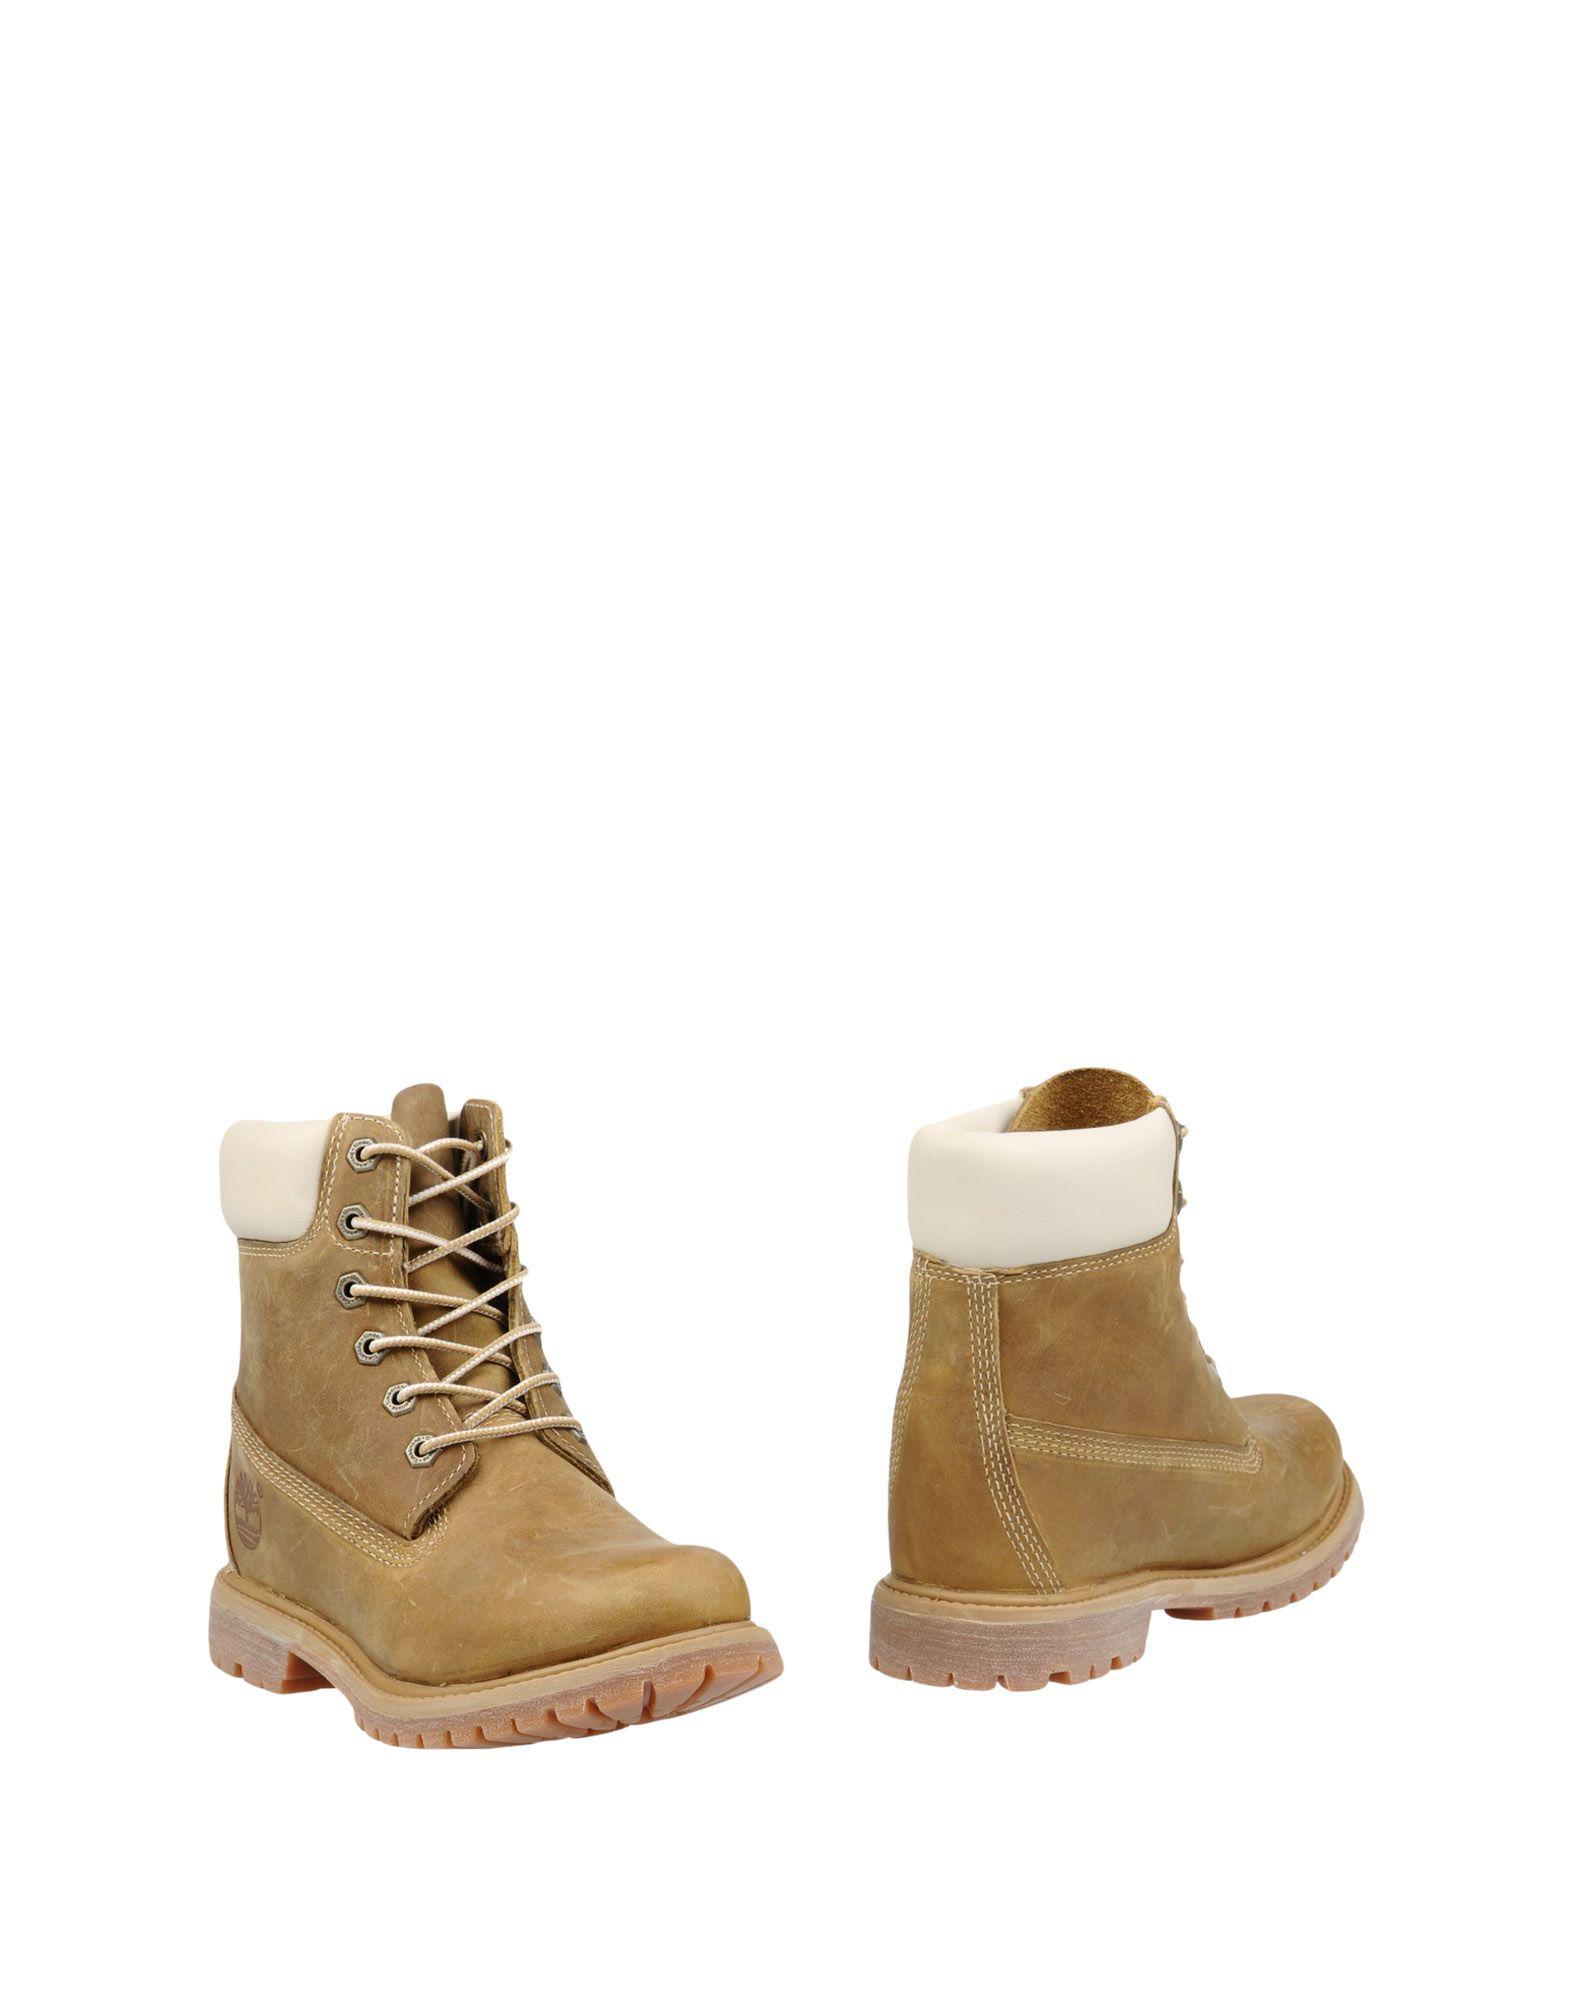 TIMBERLAND Полусапоги и высокие ботинки timberland полусапоги и высокие ботинки